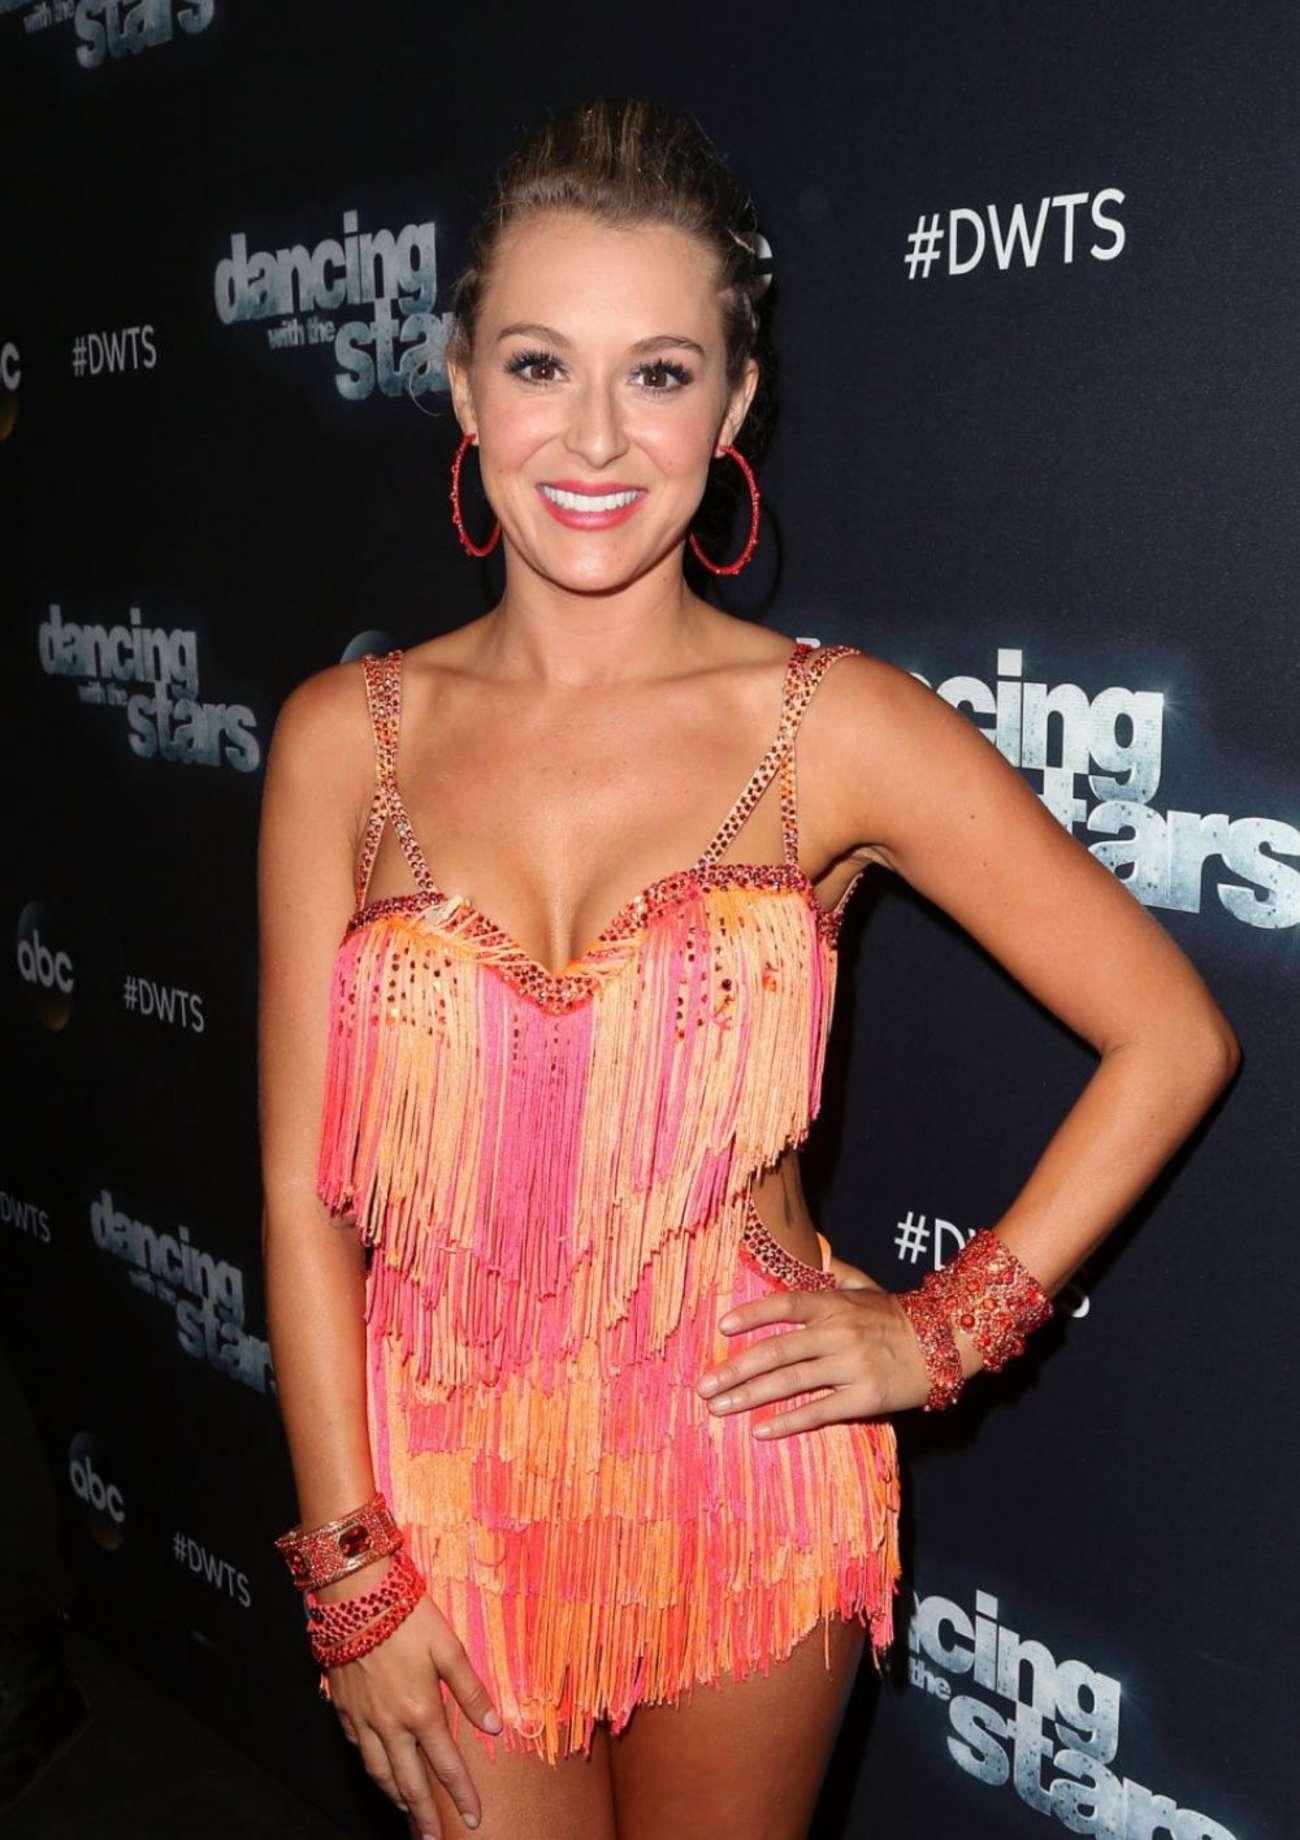 Alexa Vega - Dancing With The Stars Photo Op in LA